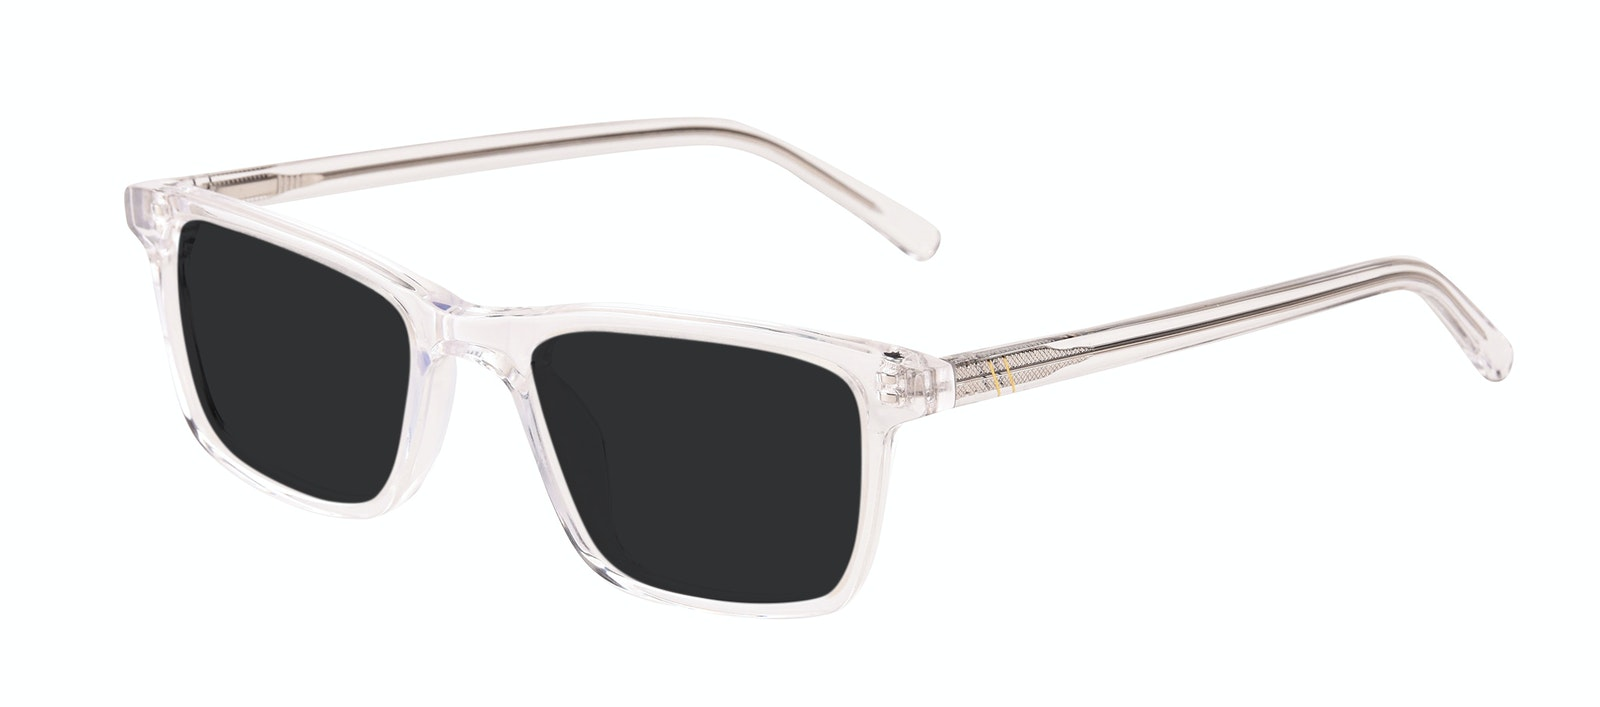 Affordable Fashion Glasses Rectangle Sunglasses Men Henri SML Clear Tilt